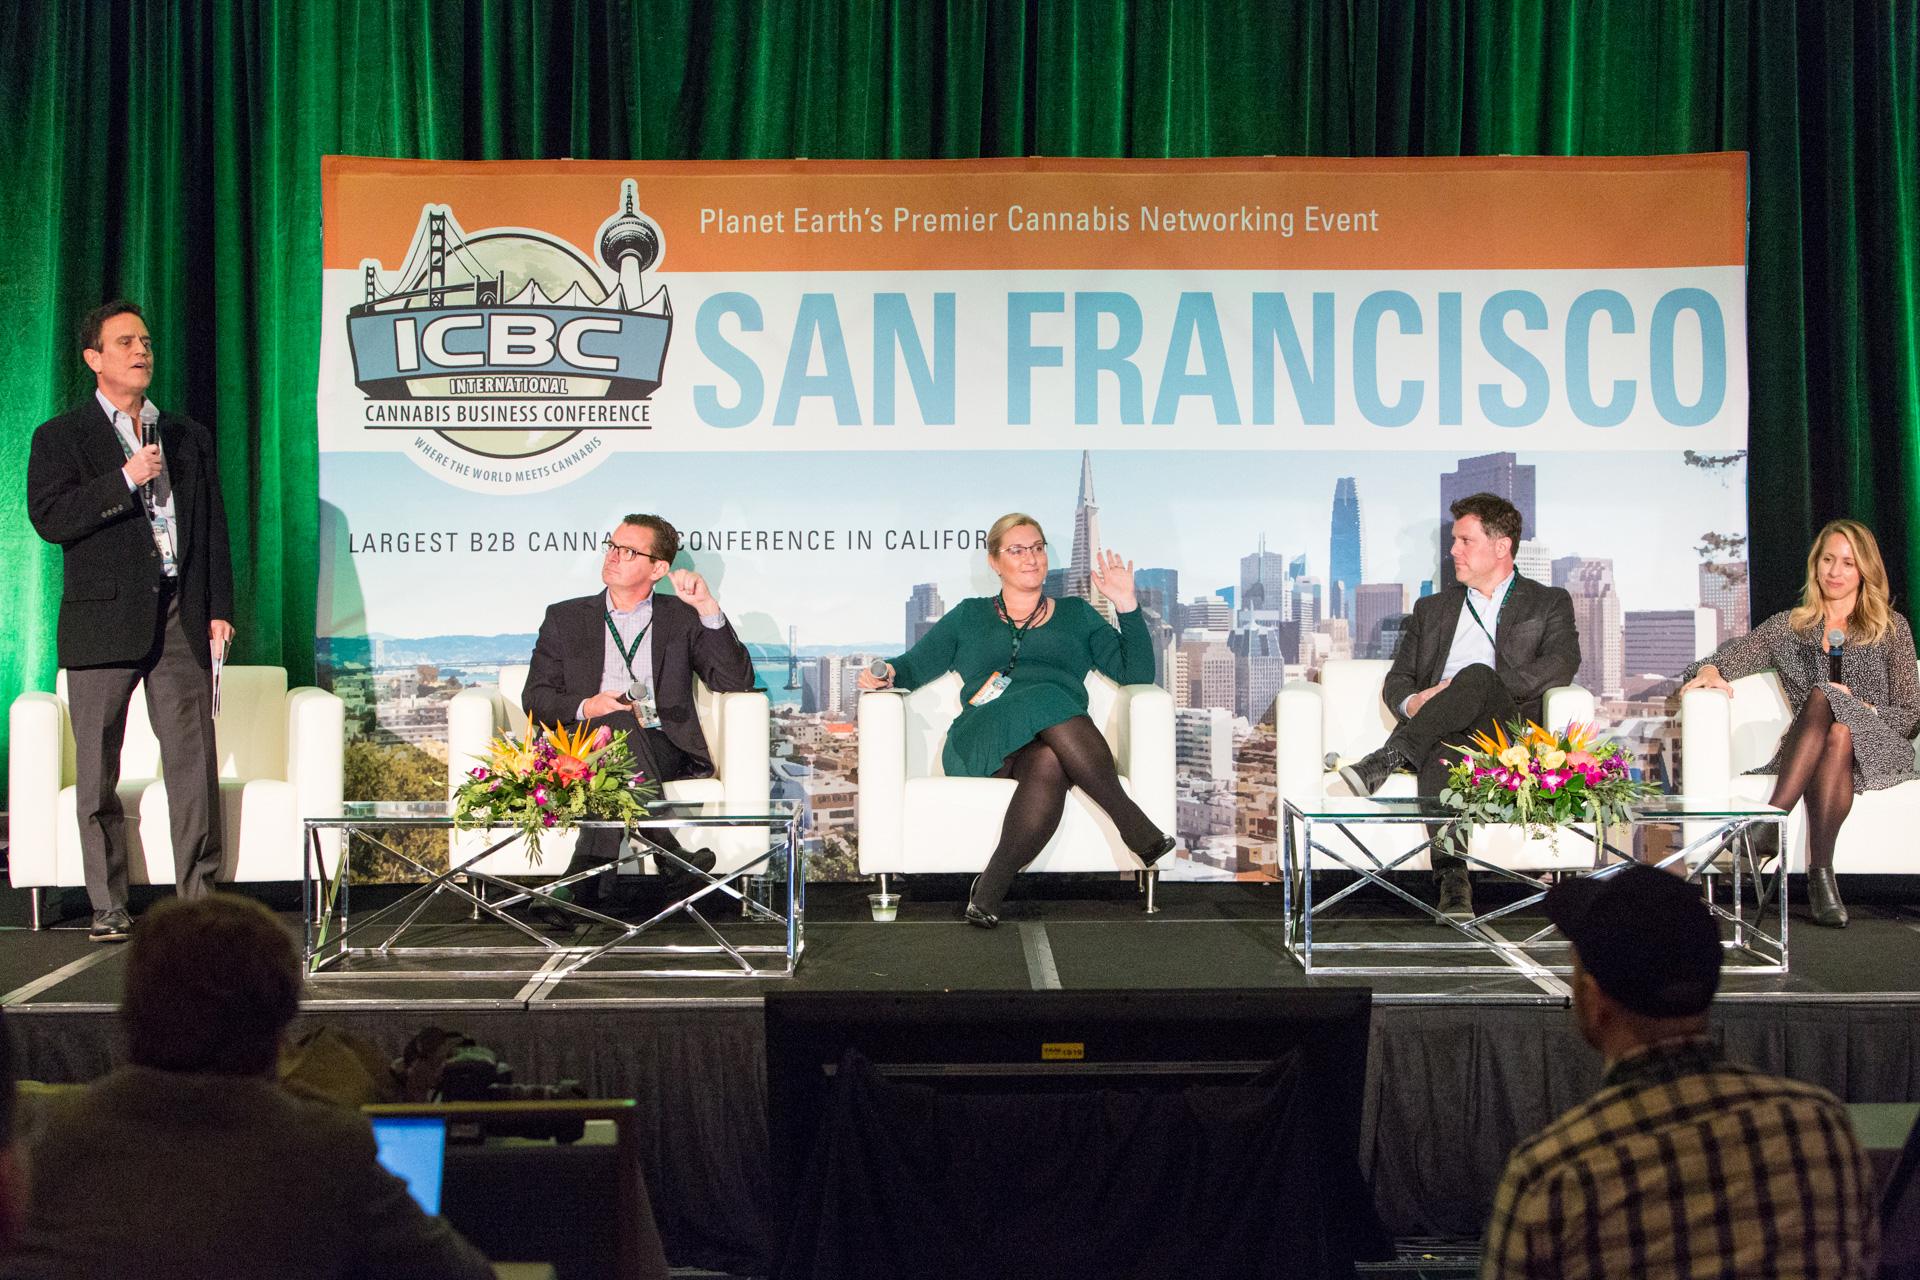 InternationalCBC-San-Francisco-2020-21